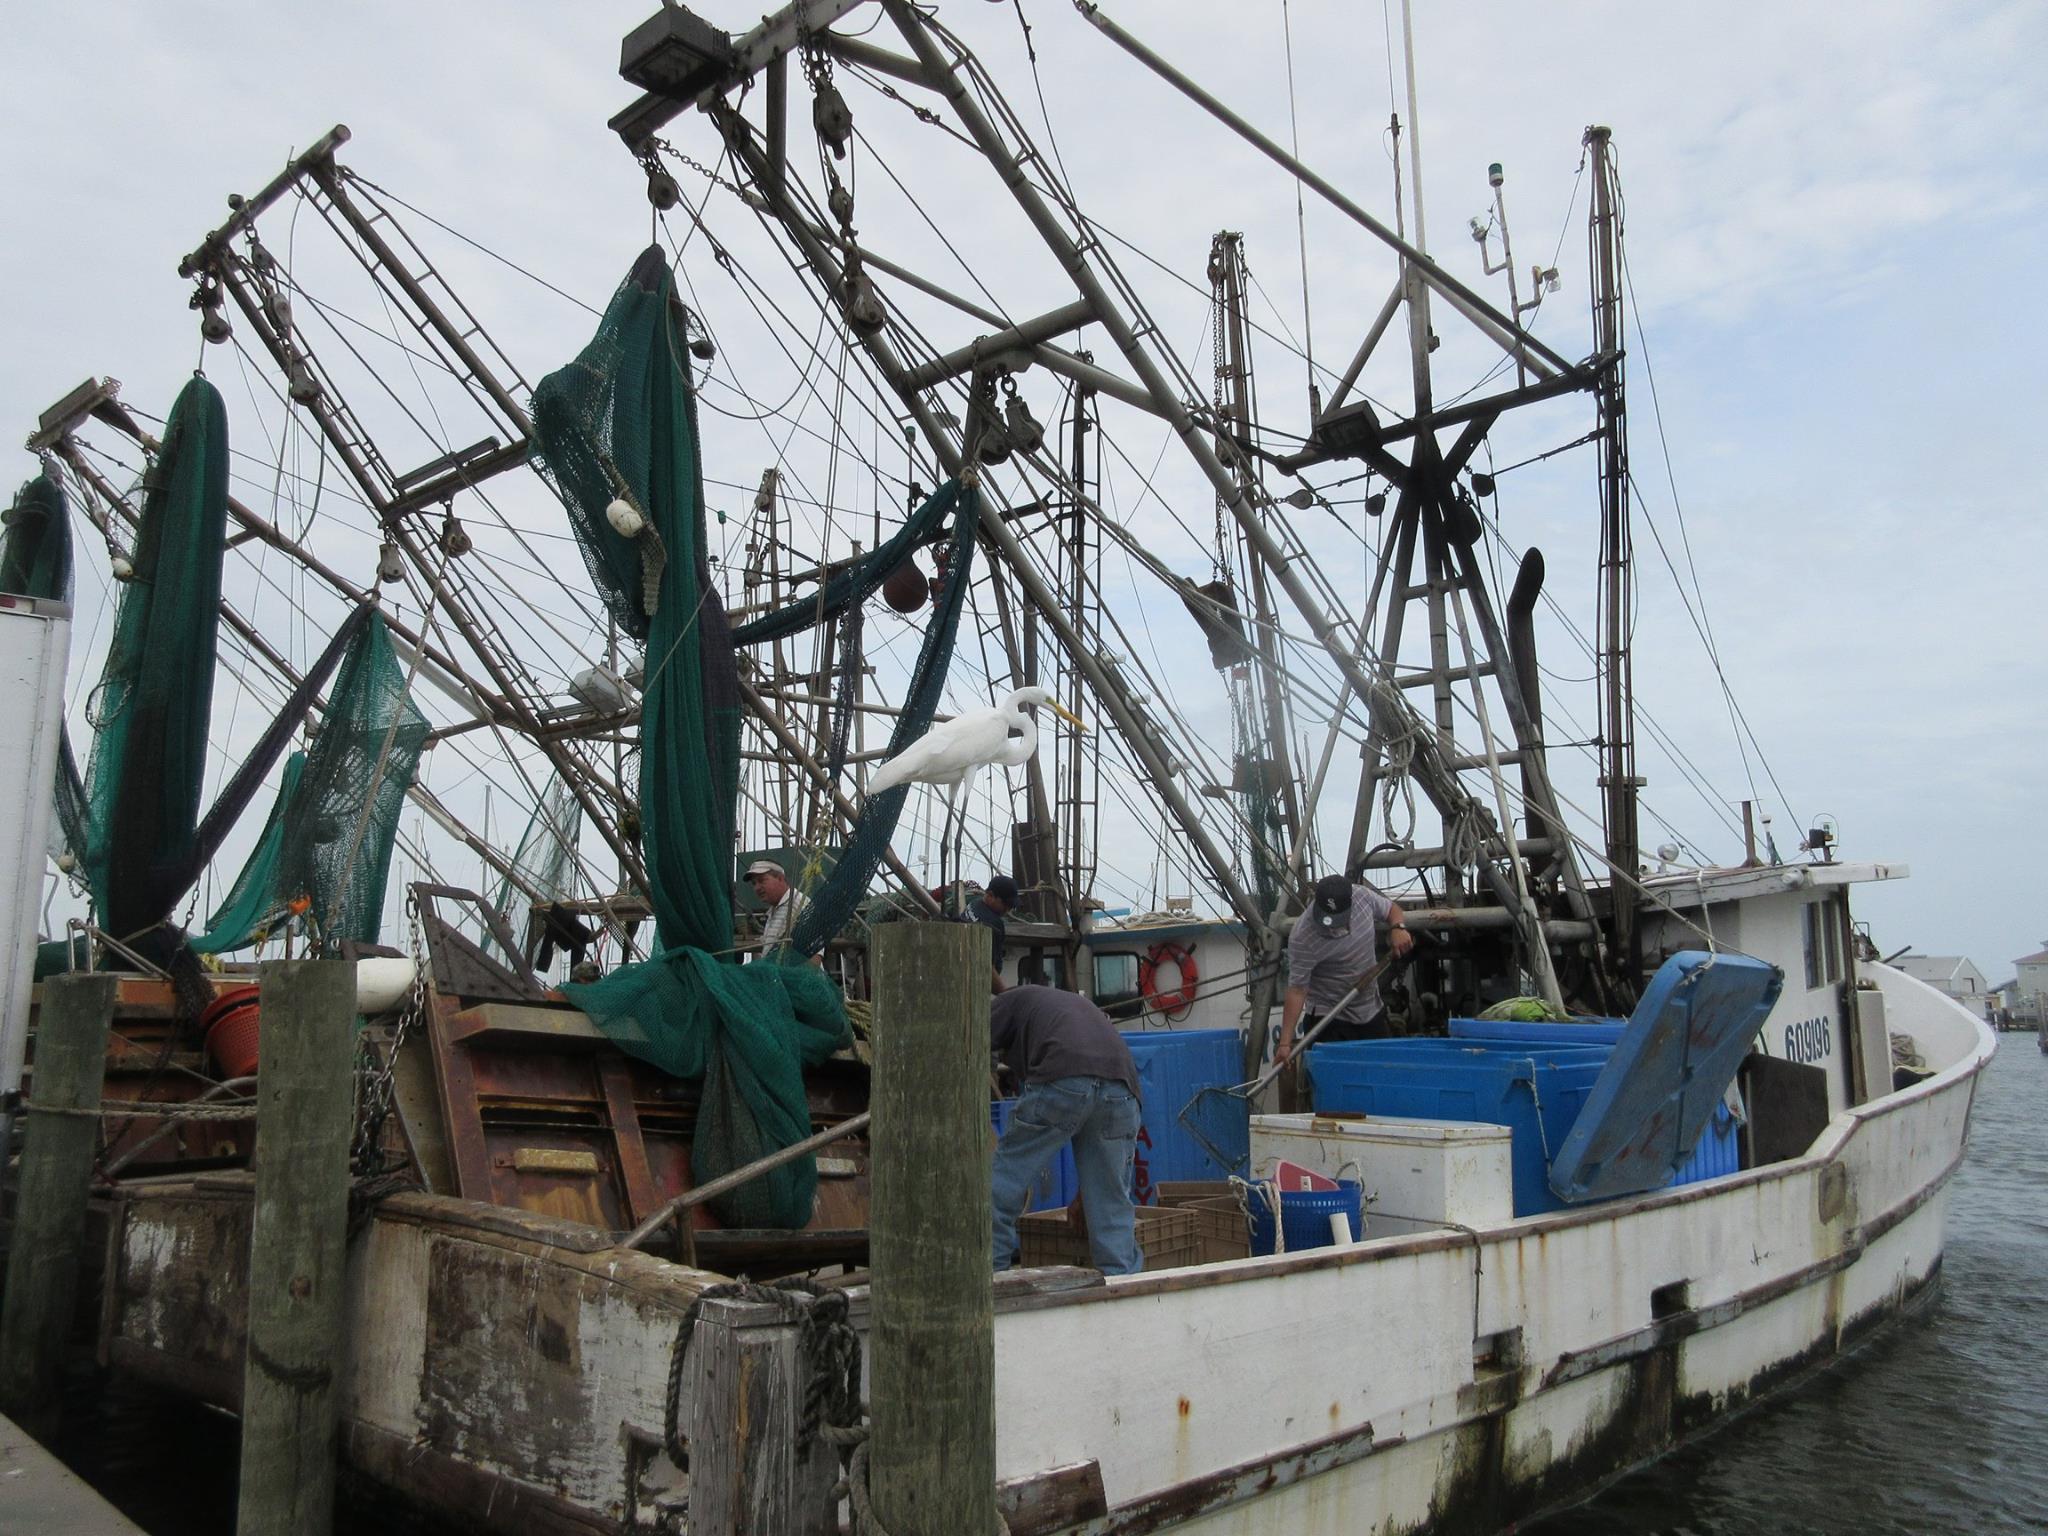 ShrimpboatEgret